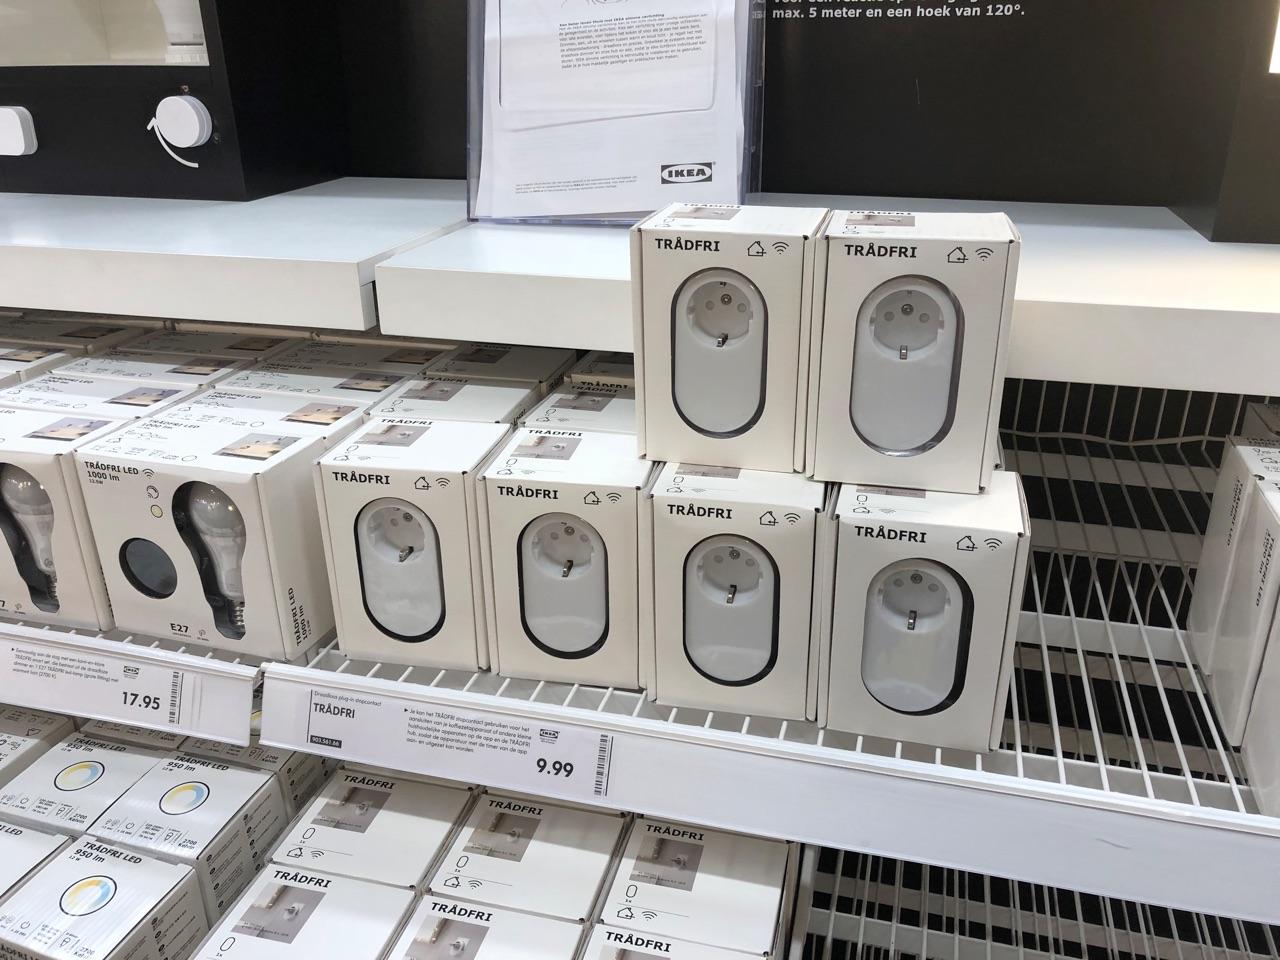 Tradfri stekkers bij IKEA